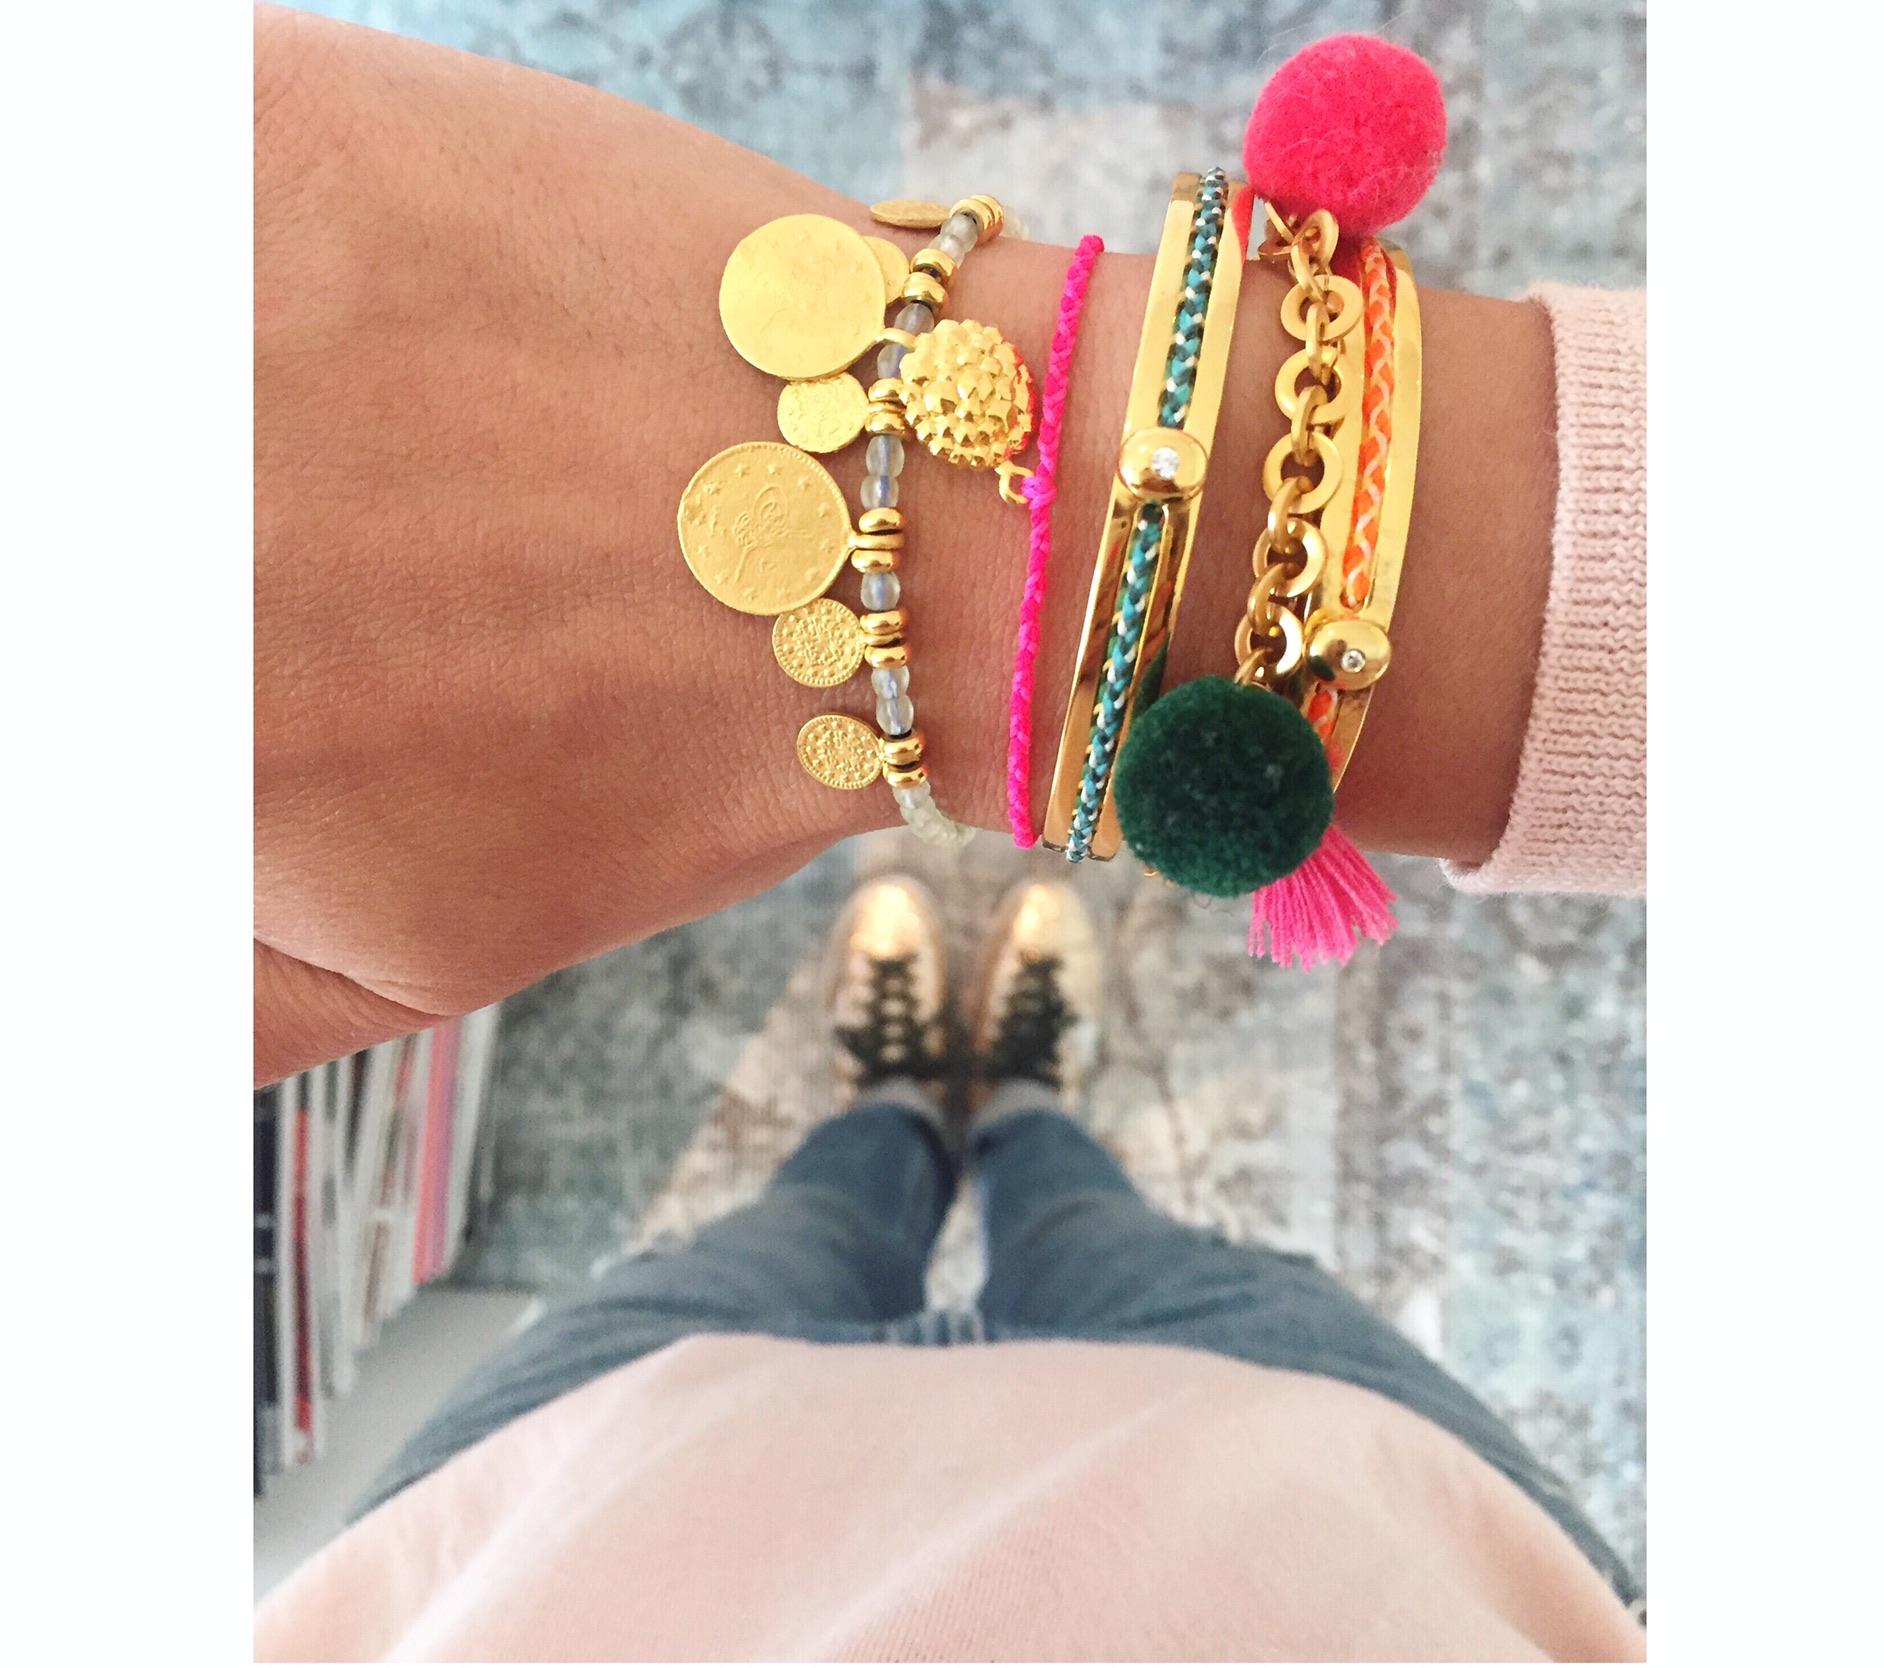 eveslookbook-saralashay-bracelets-getragen-buntermix-armcandy-tasselbracelet-pimpyourstyle